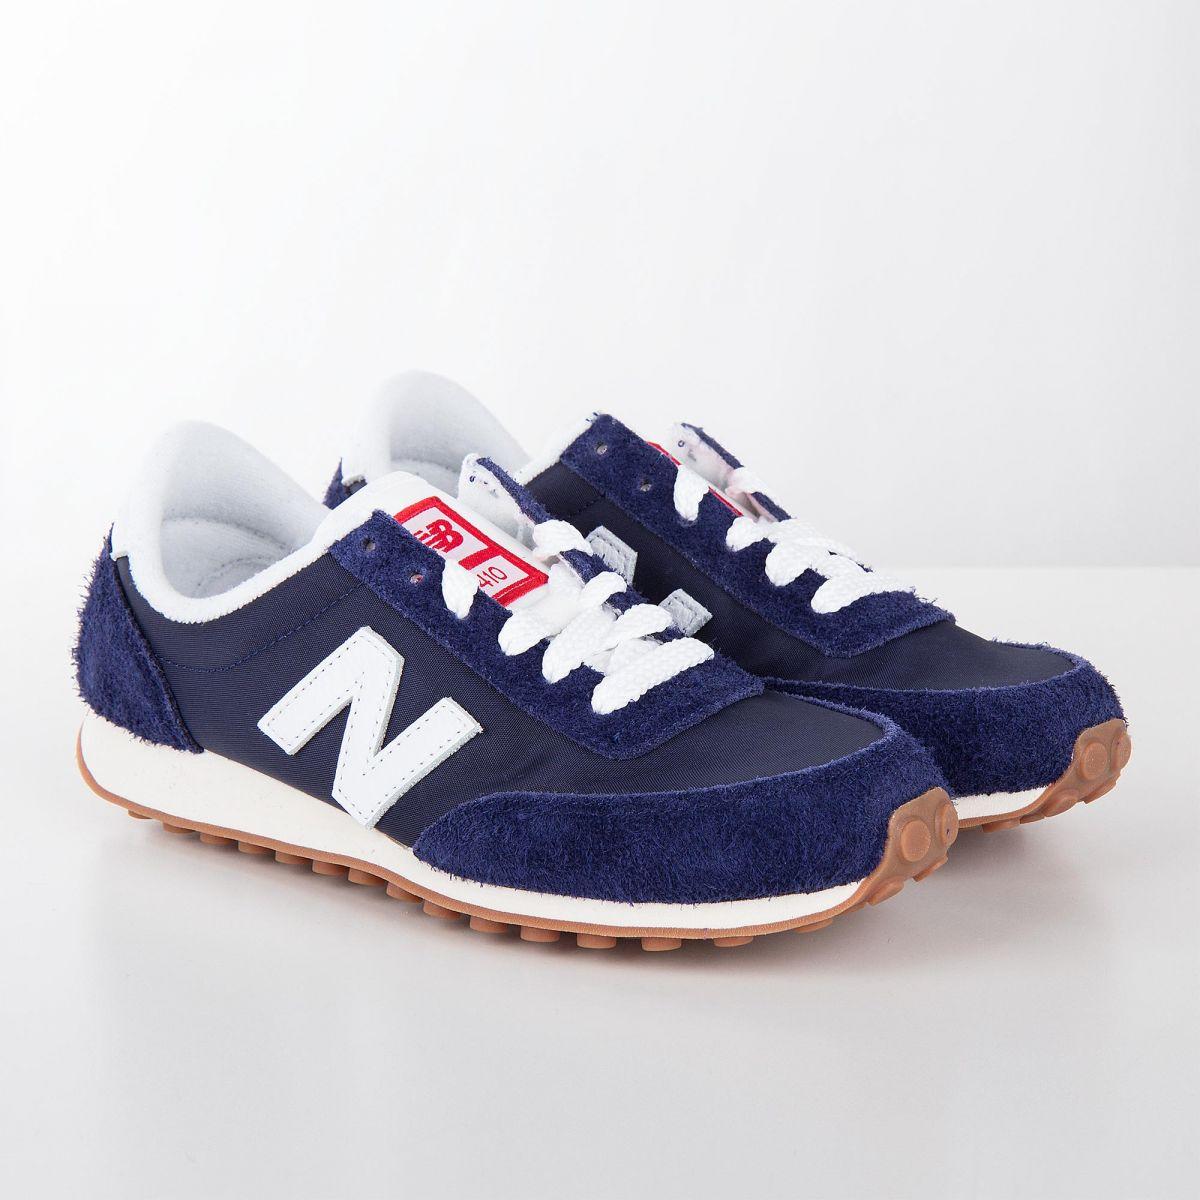 new style 5aa37 9d800 Baskets sneakers U410NY bleu marine enfant NEW BALANCE marque pas cher prix  dégriffés destockage ...